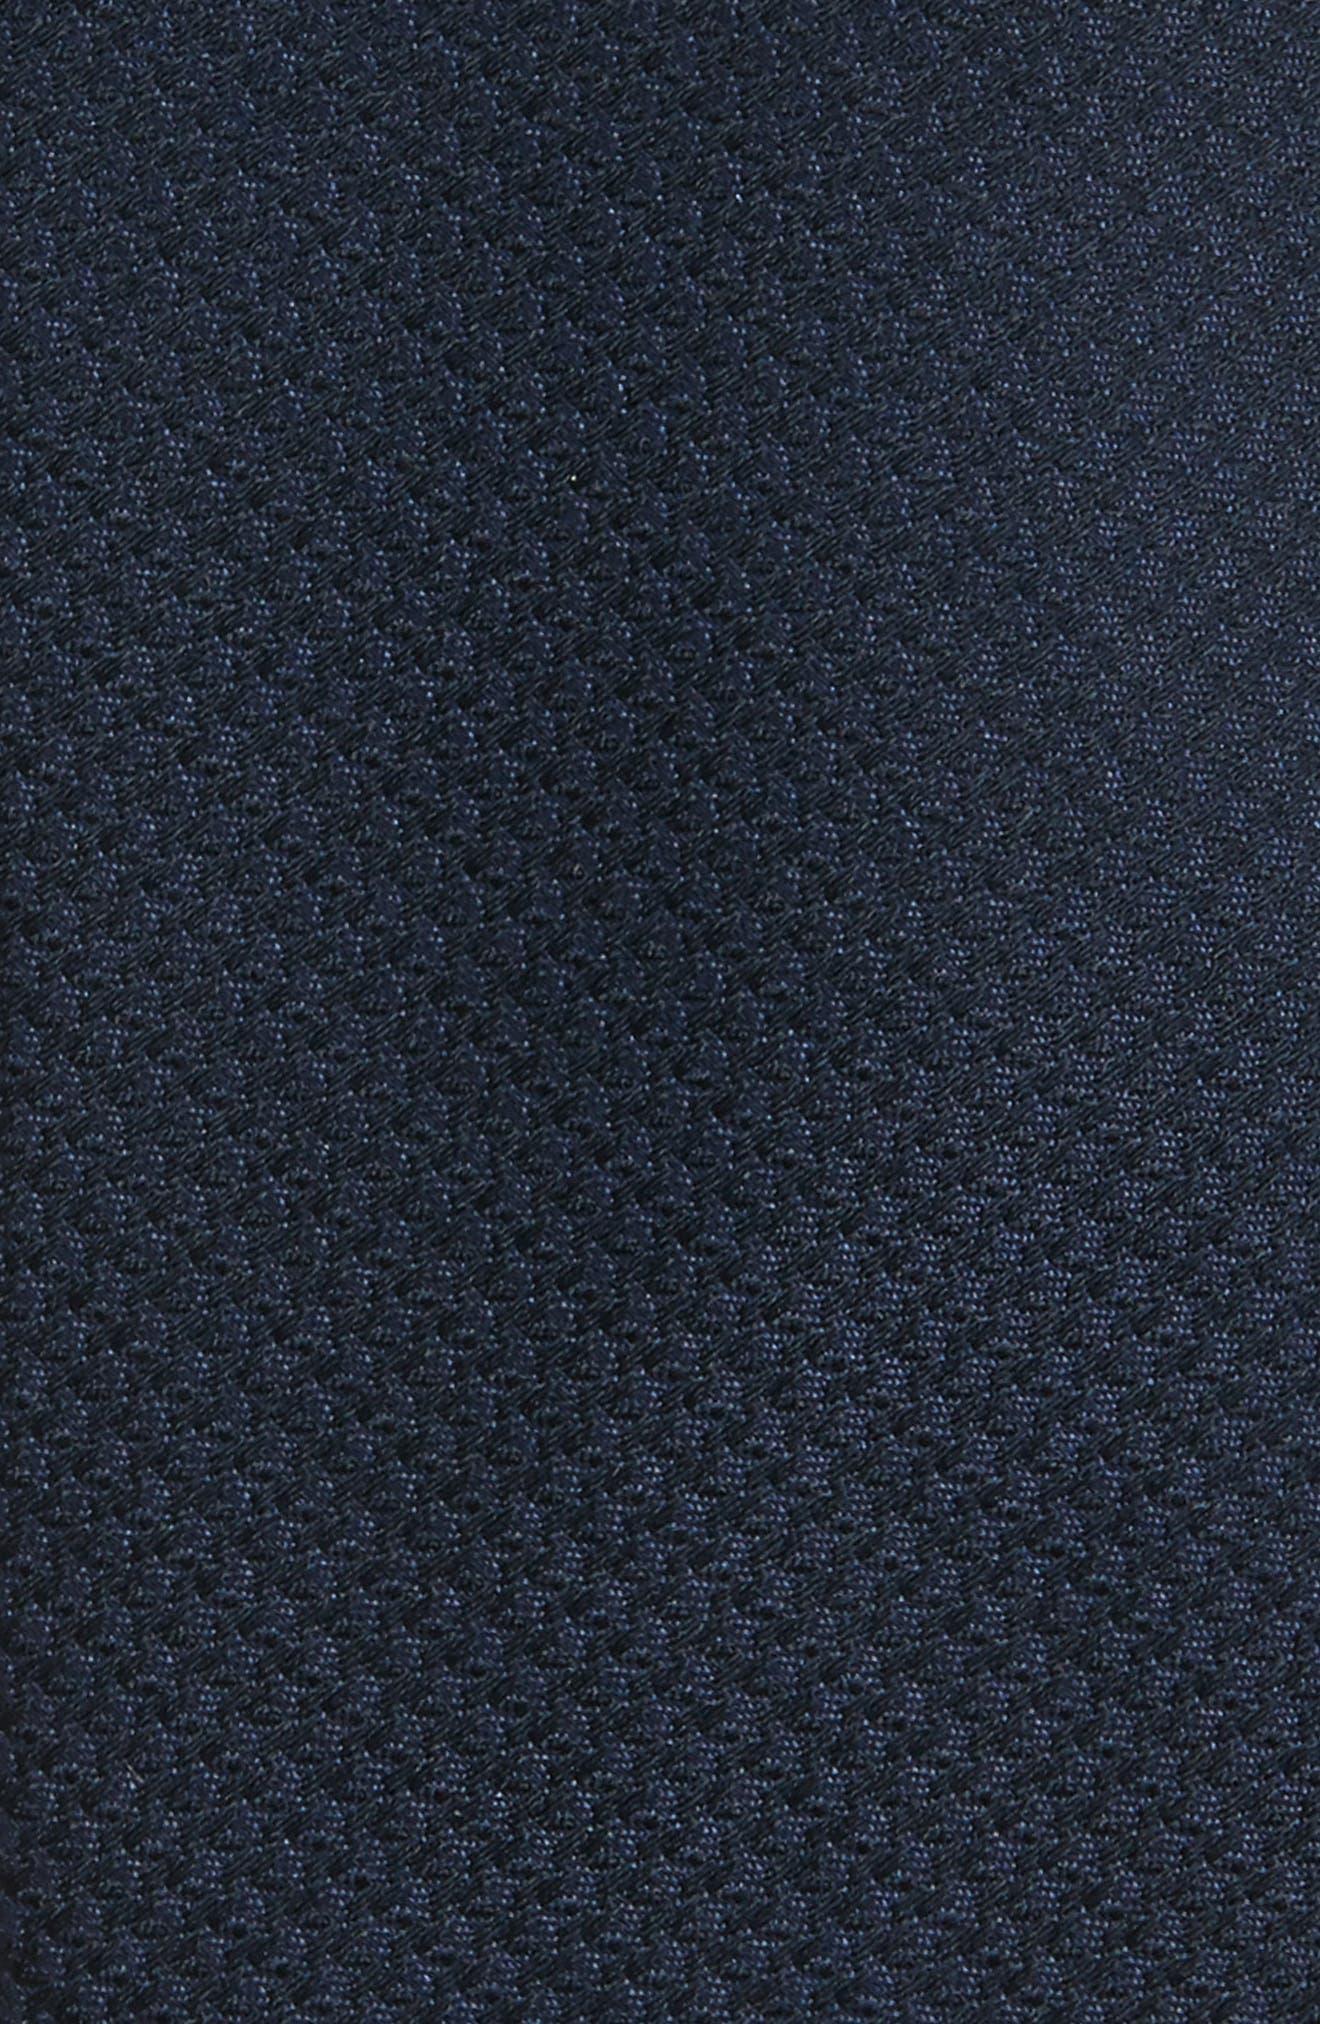 Midnight Silk Tie,                             Alternate thumbnail 2, color,                             411